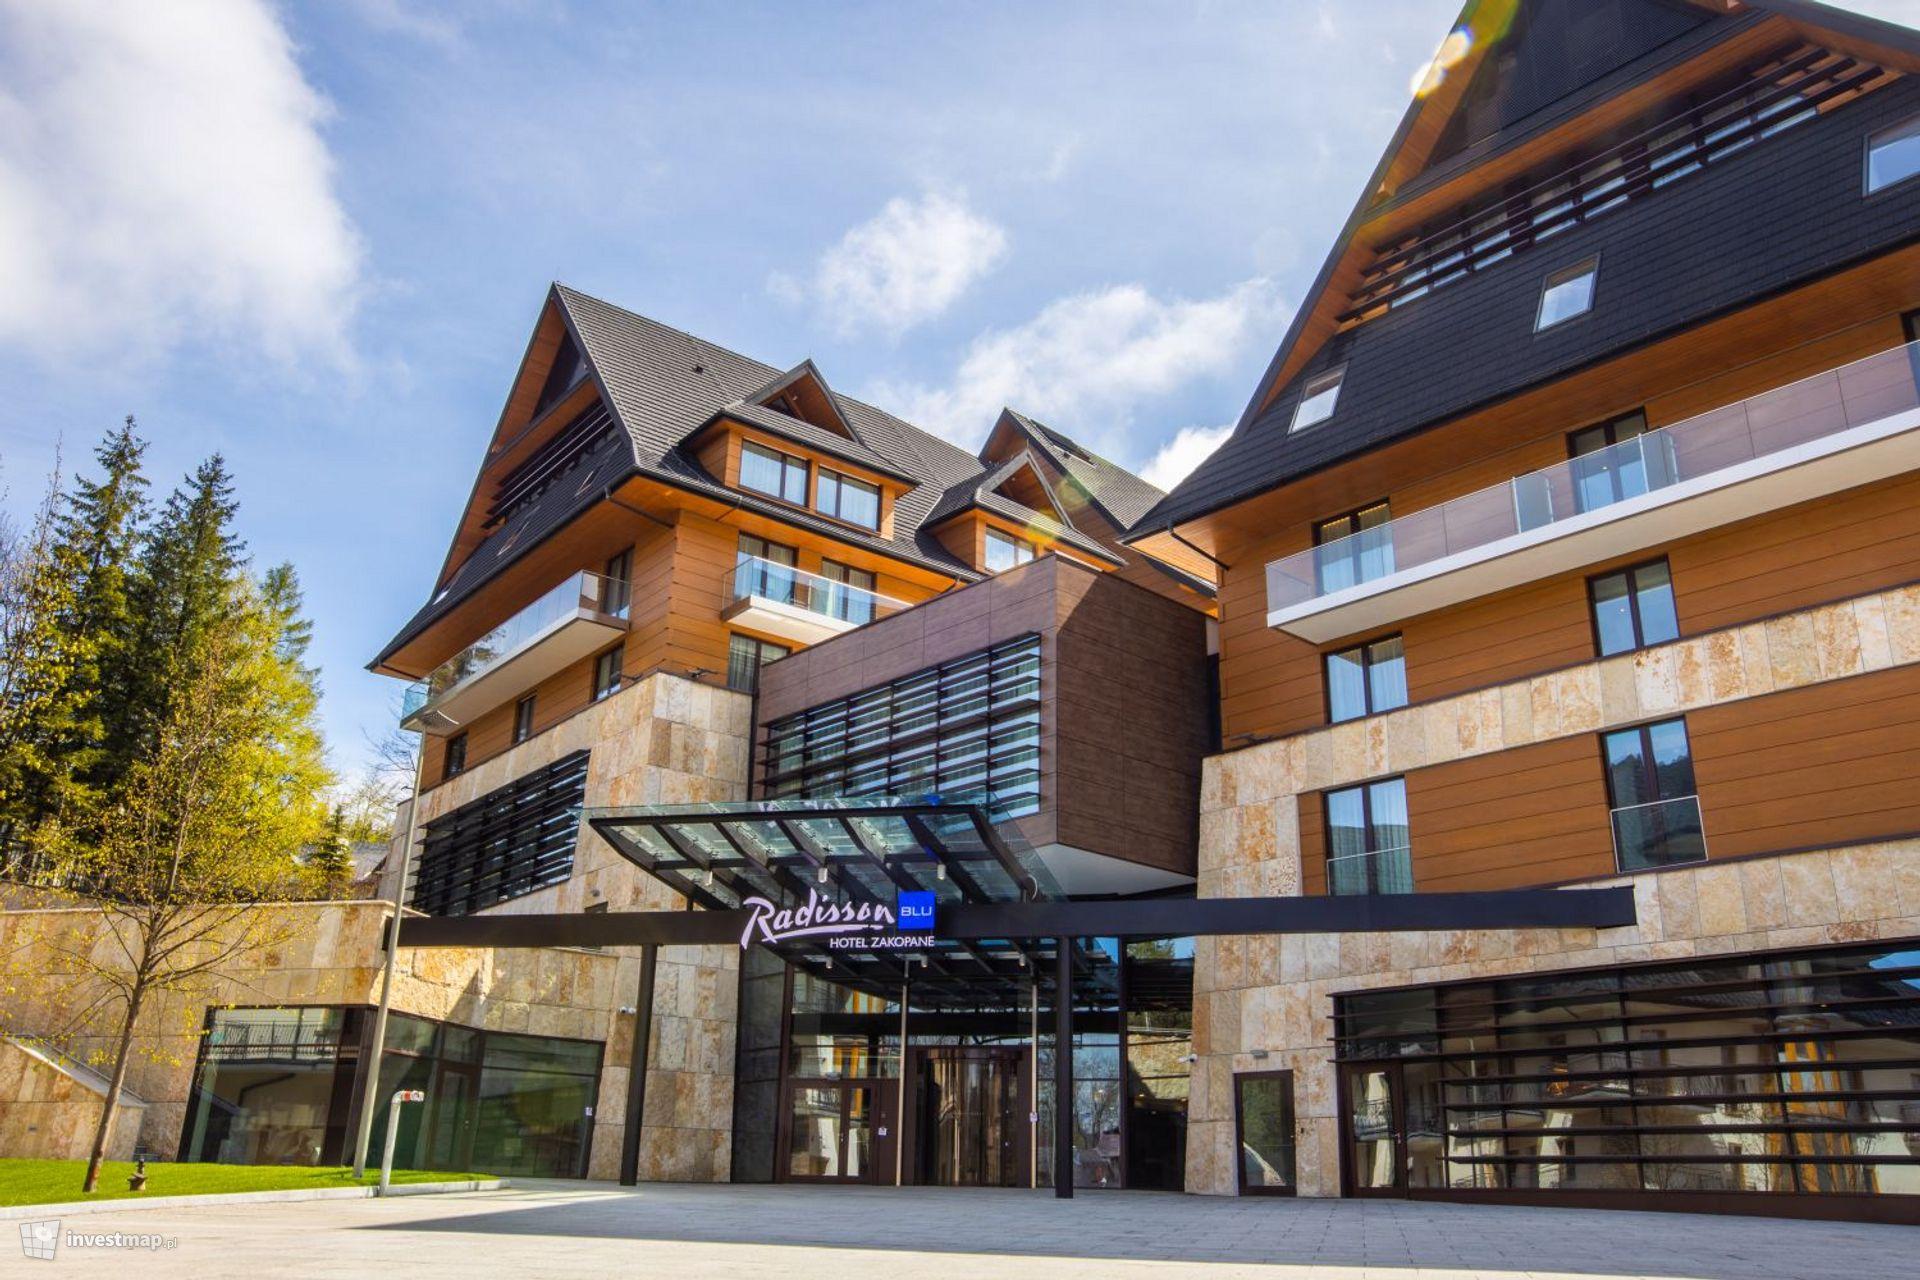 Kompleks Radisson Blue Hotel & Residences